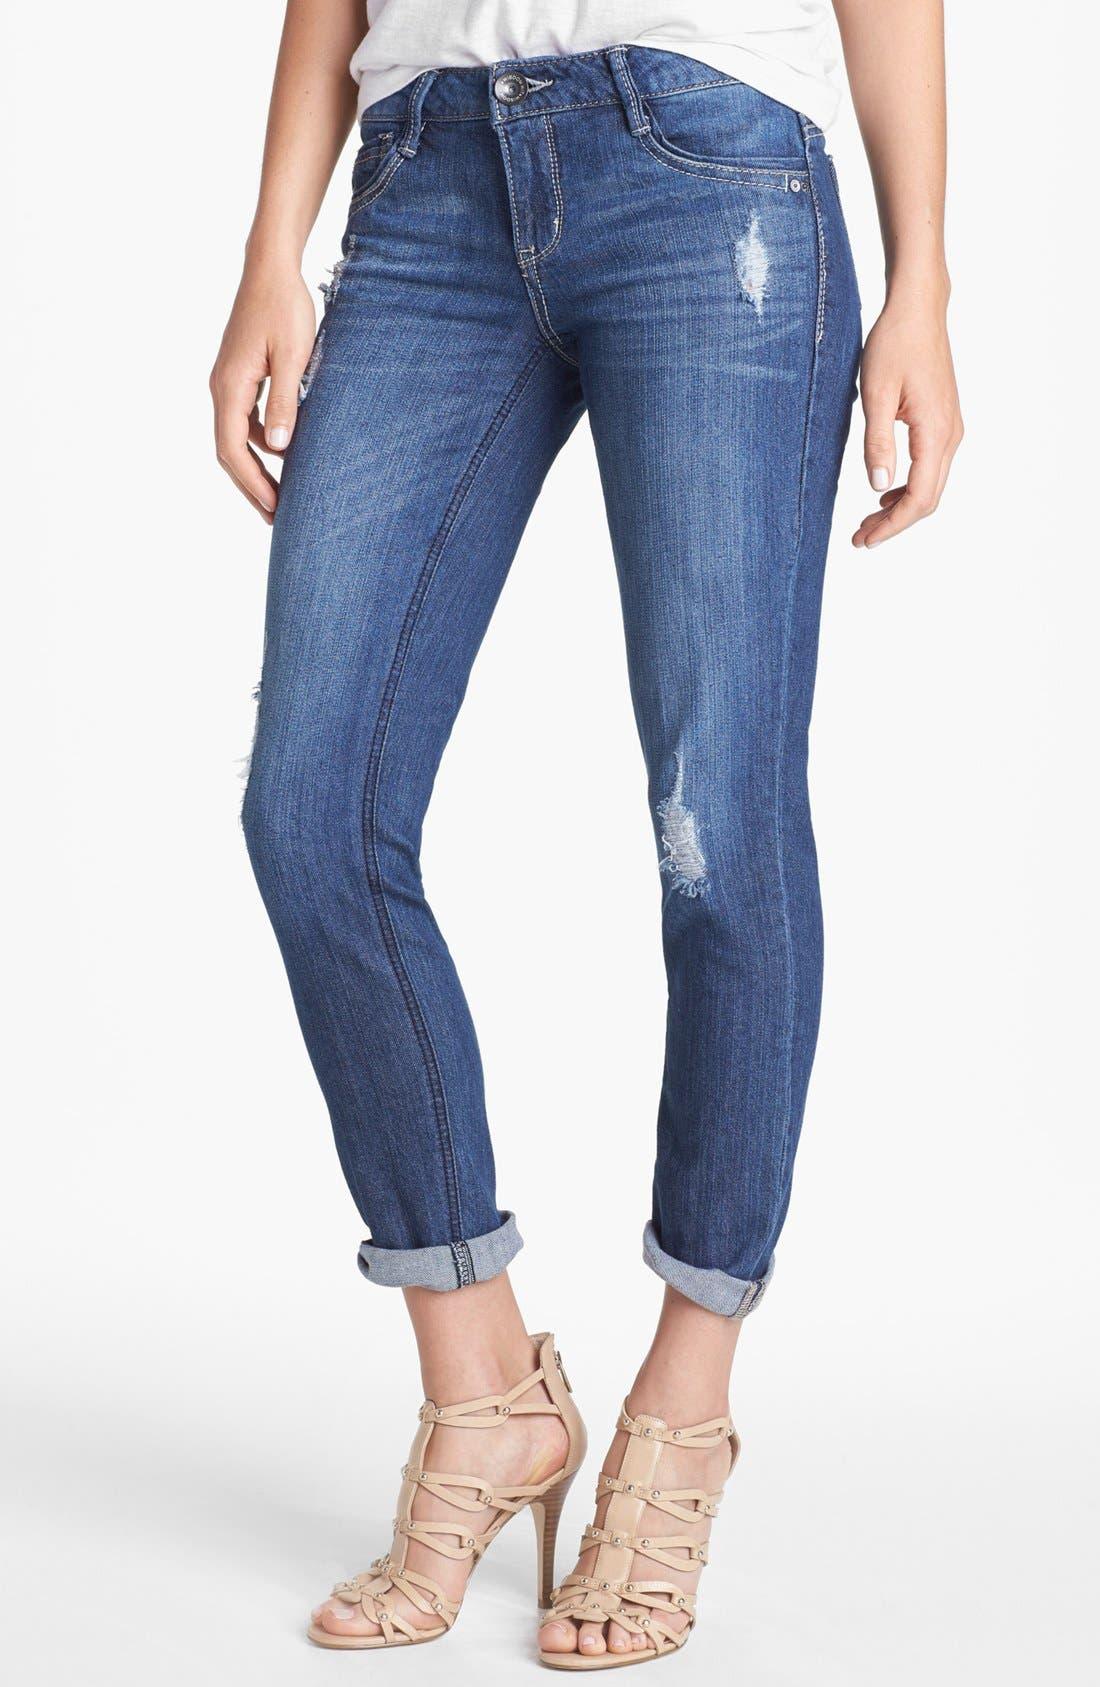 Main Image - Wit & Wisdom Distressed Boyfriend Skinny Jeans (Indigo) (Nordstrom Exclusive)